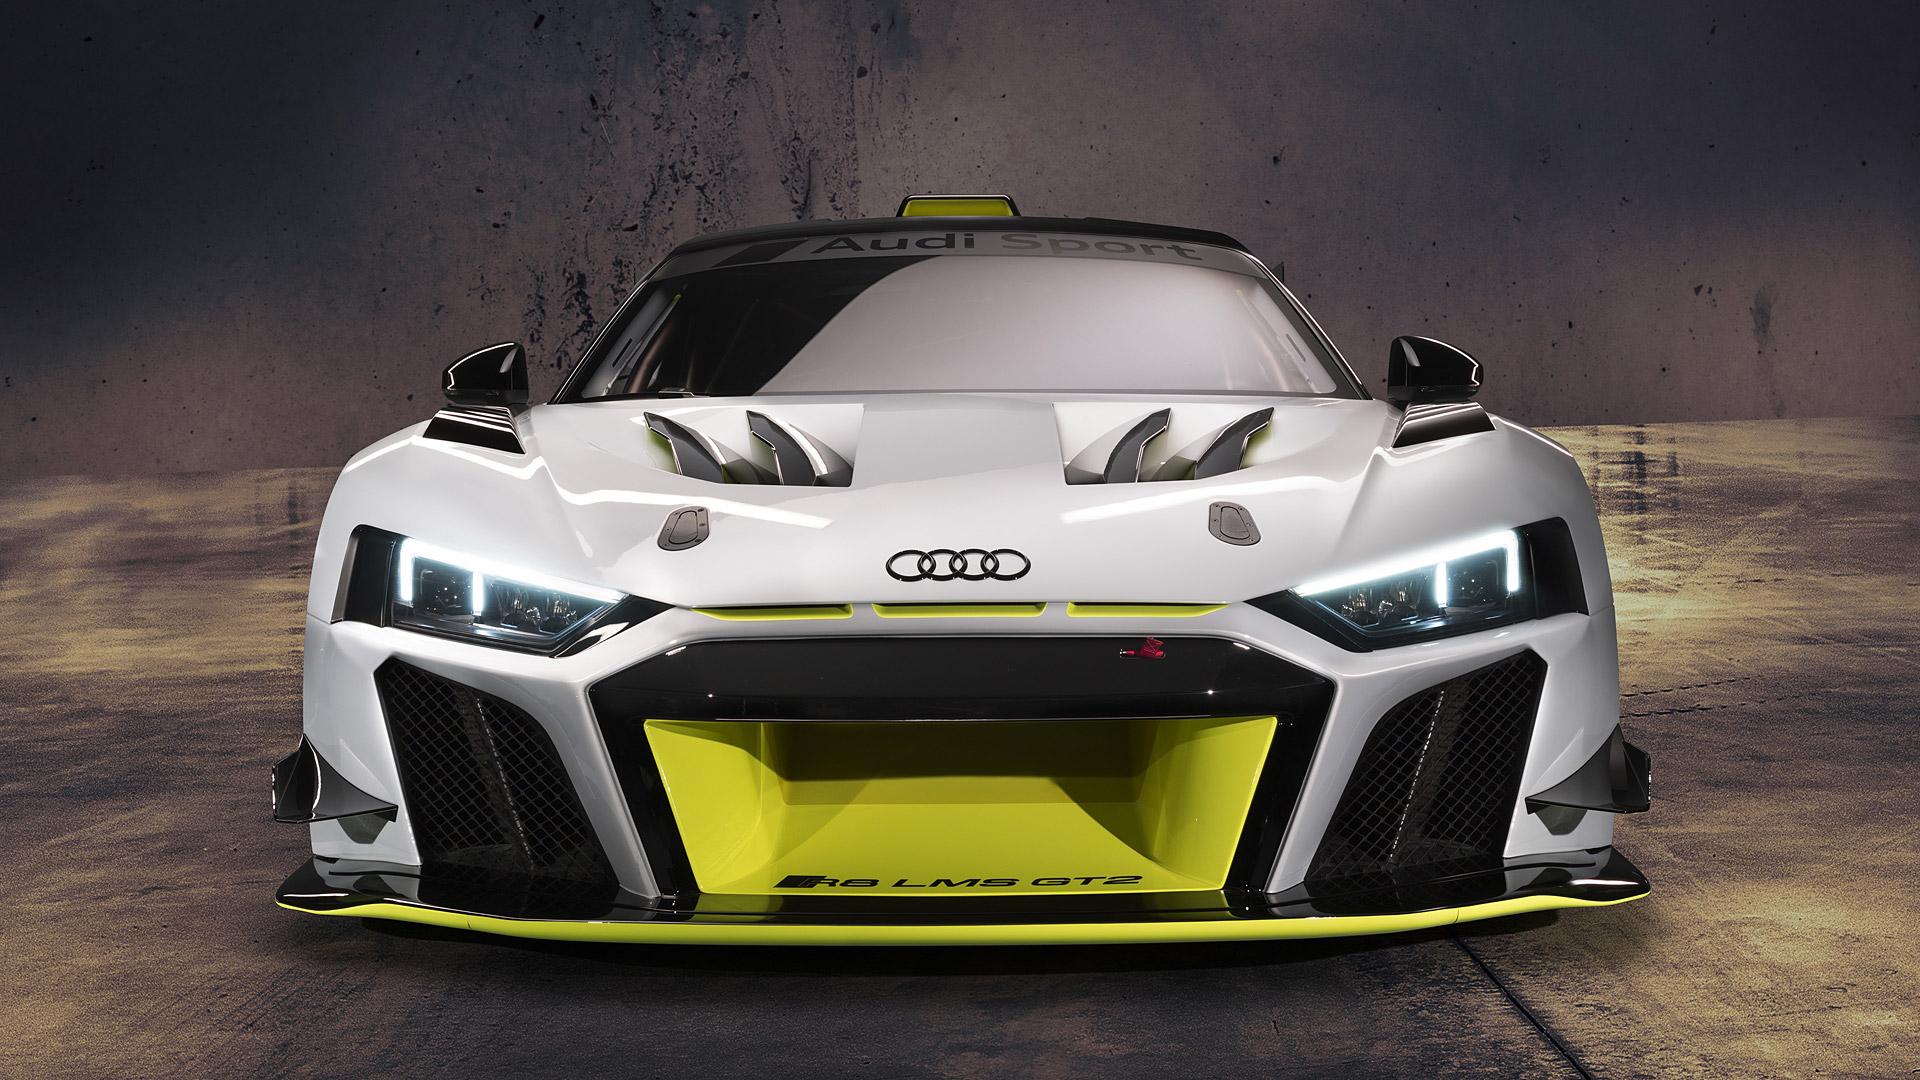 2020 Audi R8 LMS GT2 Wallpapers Specs Videos   4K HD   WSupercars 1920x1080